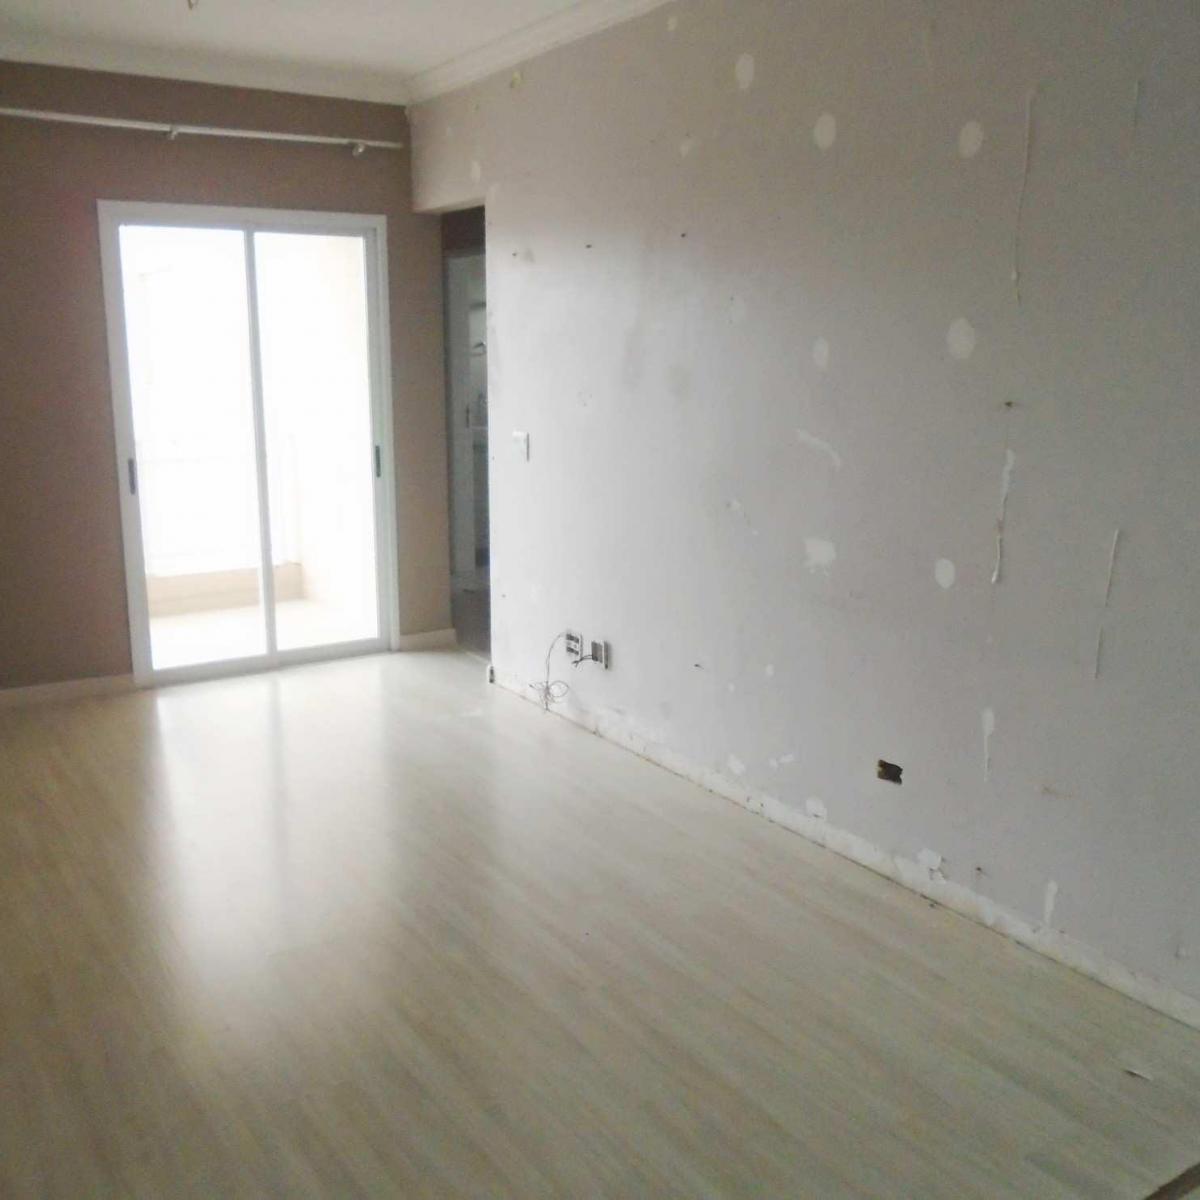 01 - Apartamento - 03 dormitórios - Vila Antartica